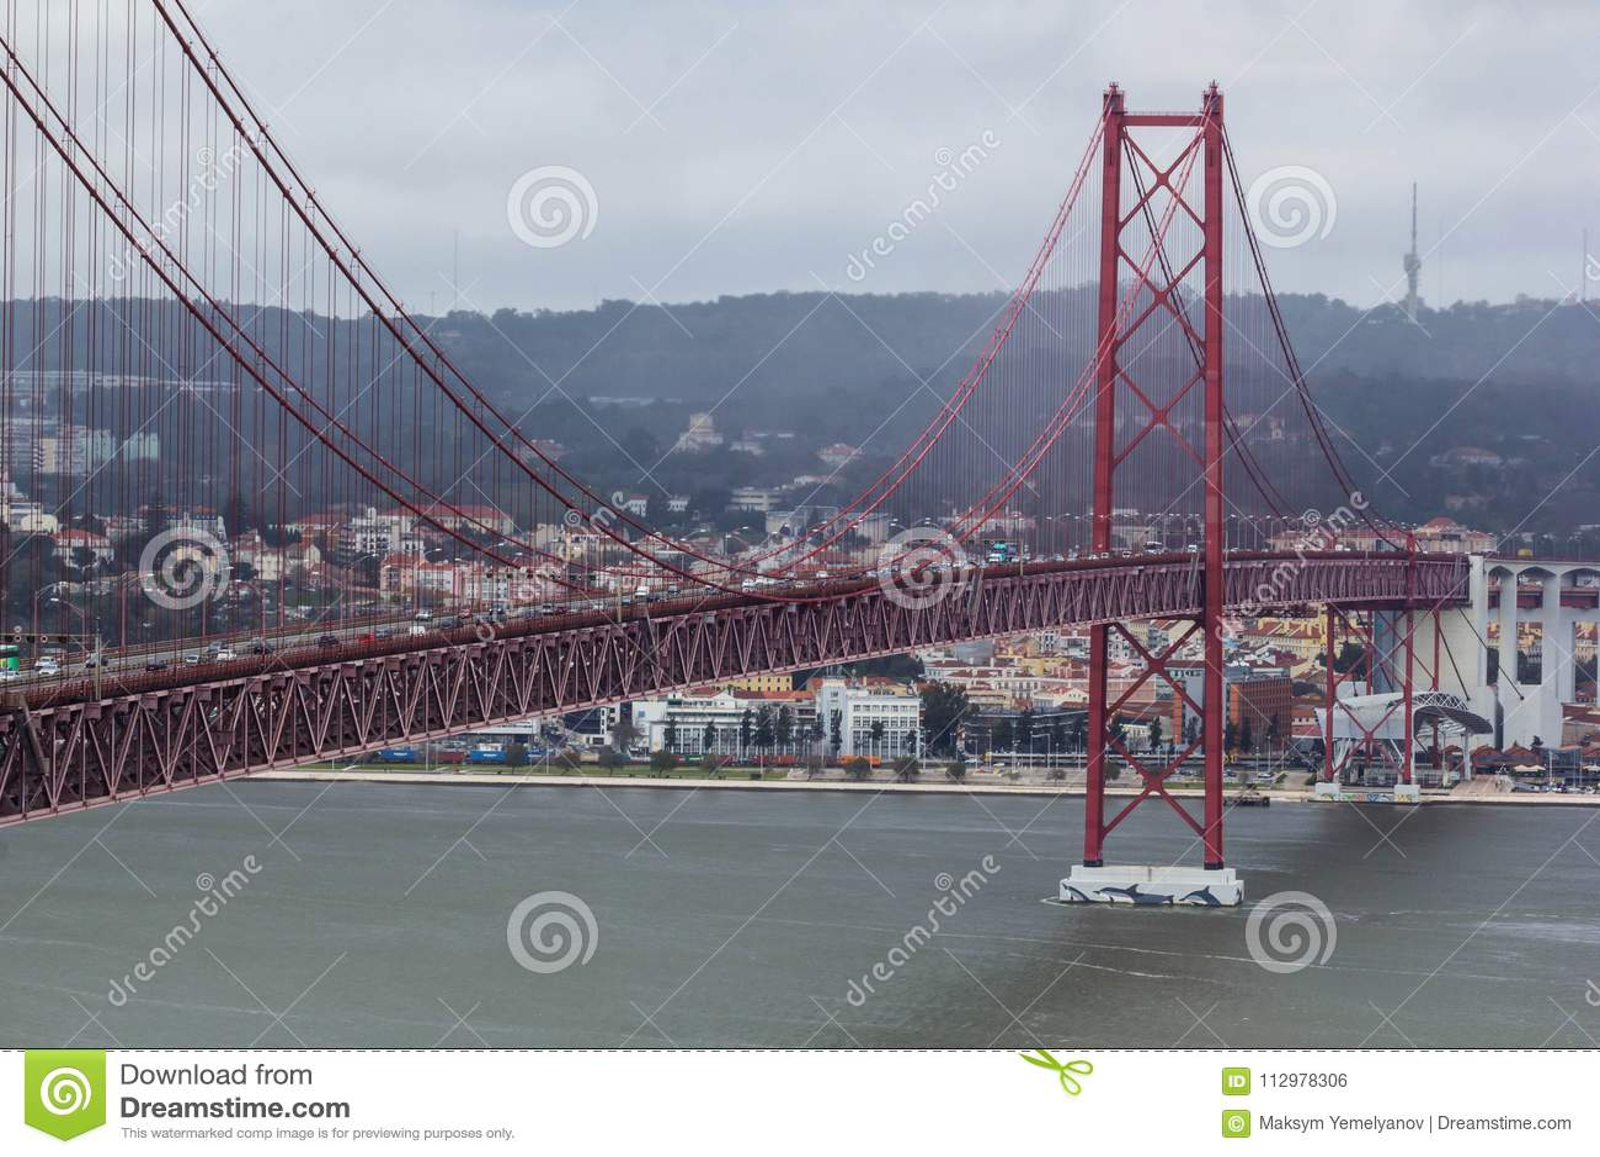 Bridge of 25th aprilPonte 25 de Abril in Lisbon, Portugal